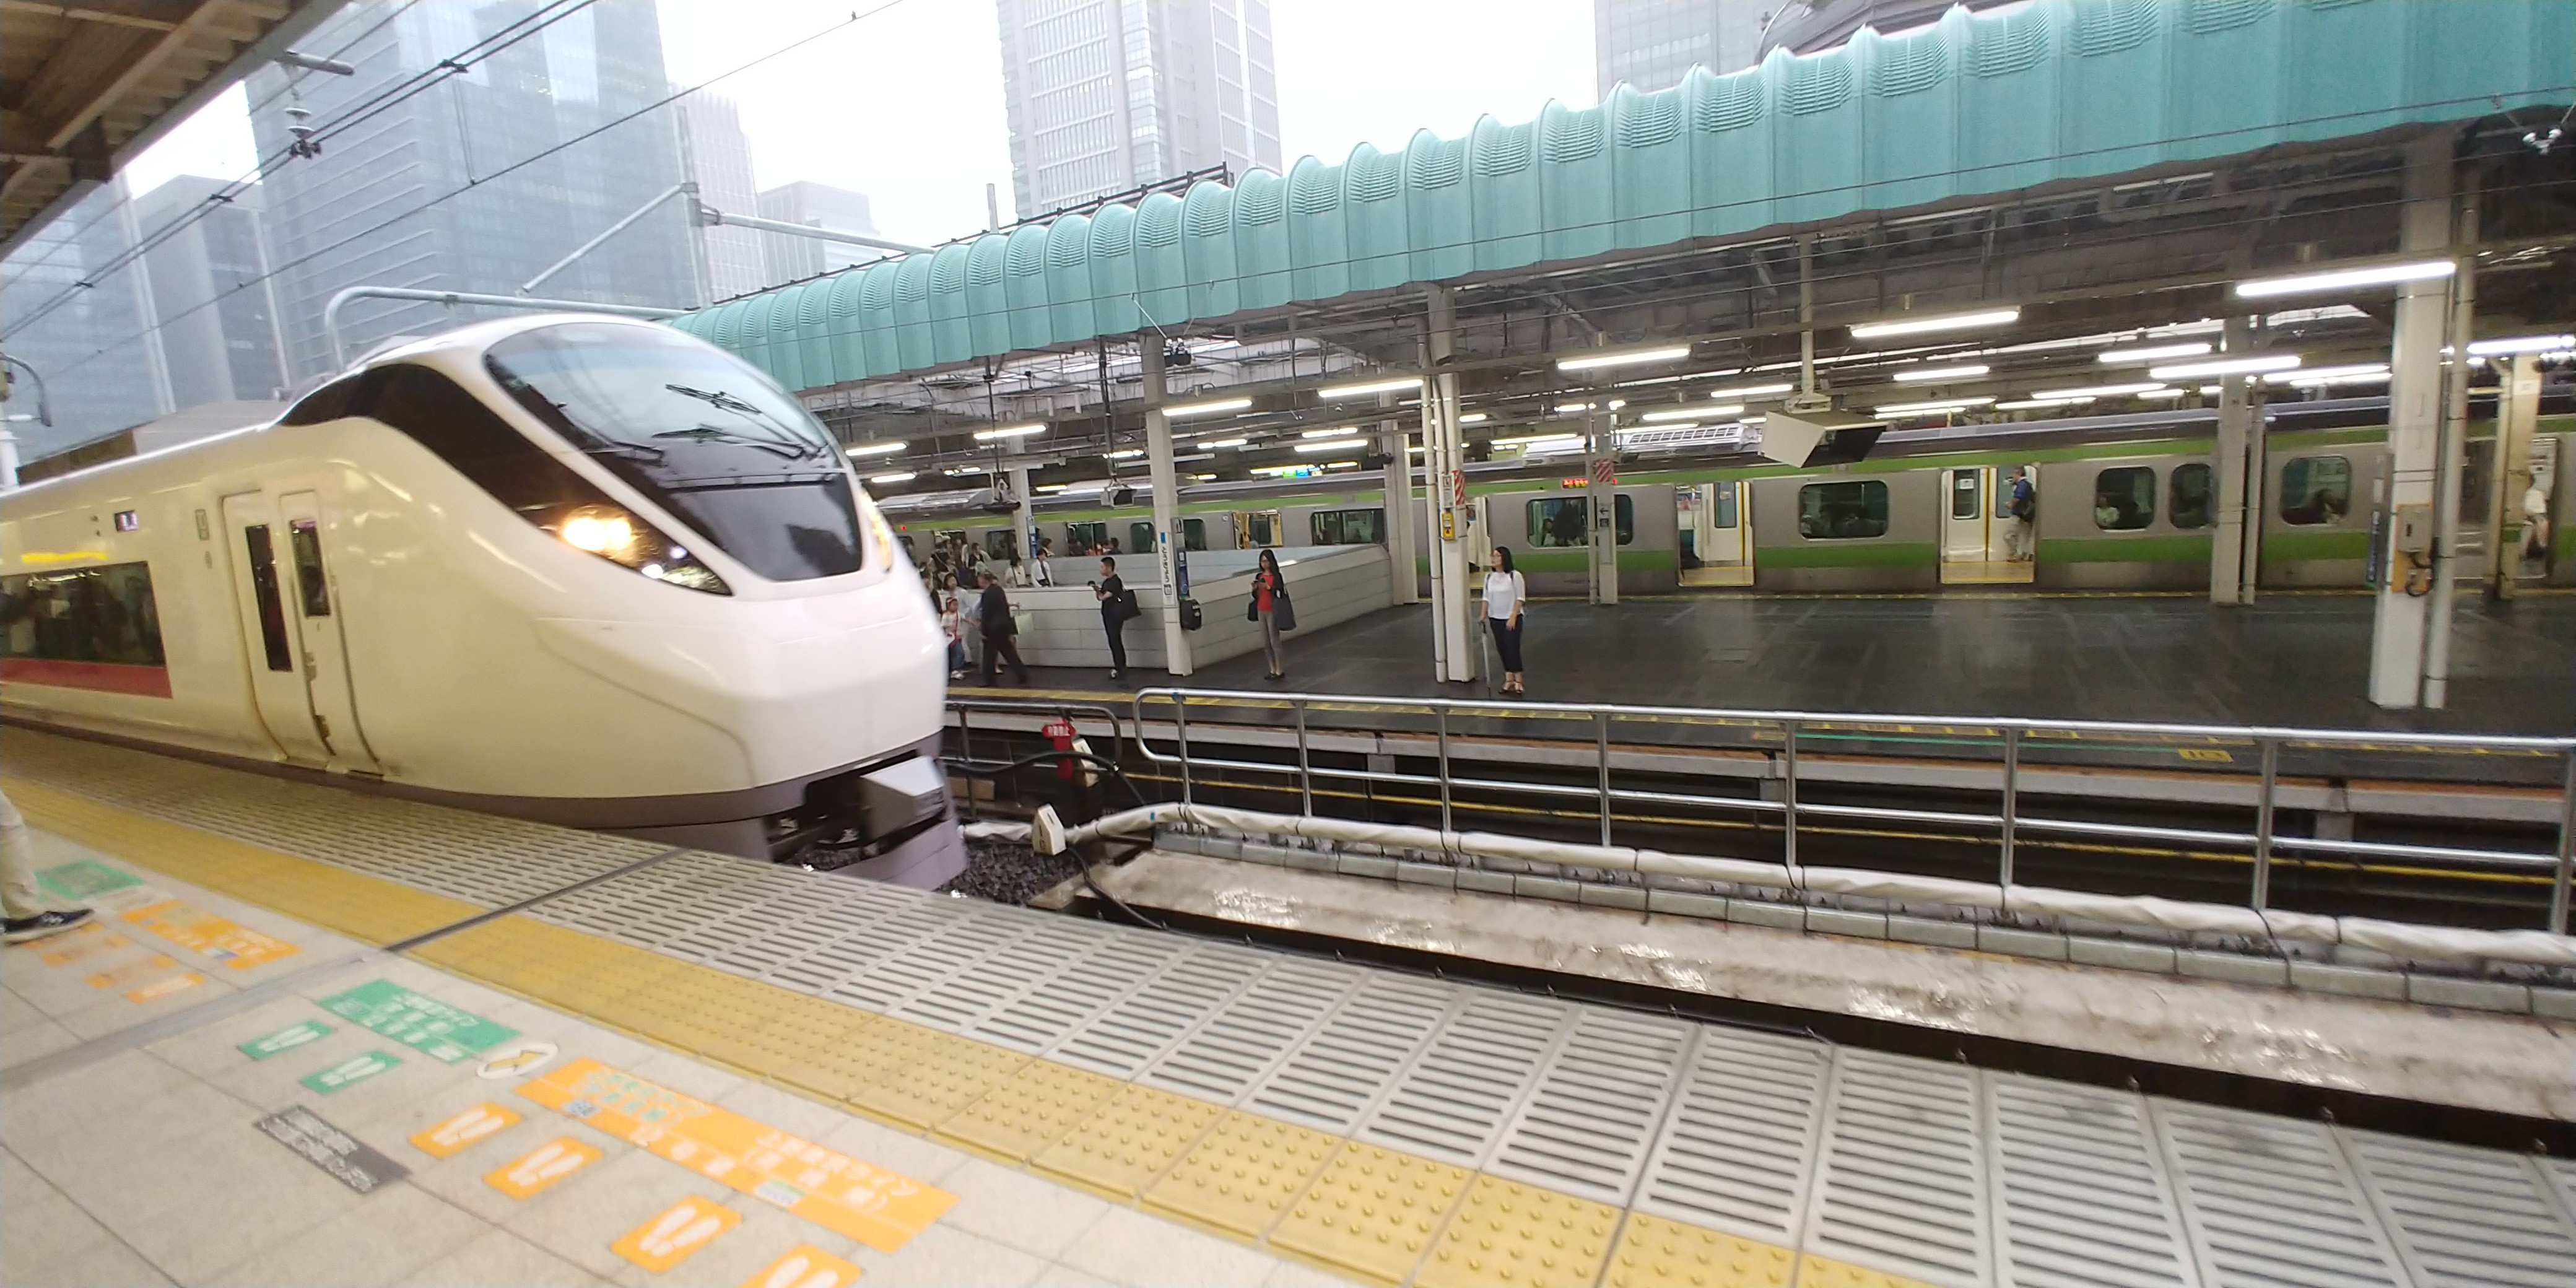 f:id:kishuji-kaisoku:20191211114027j:image